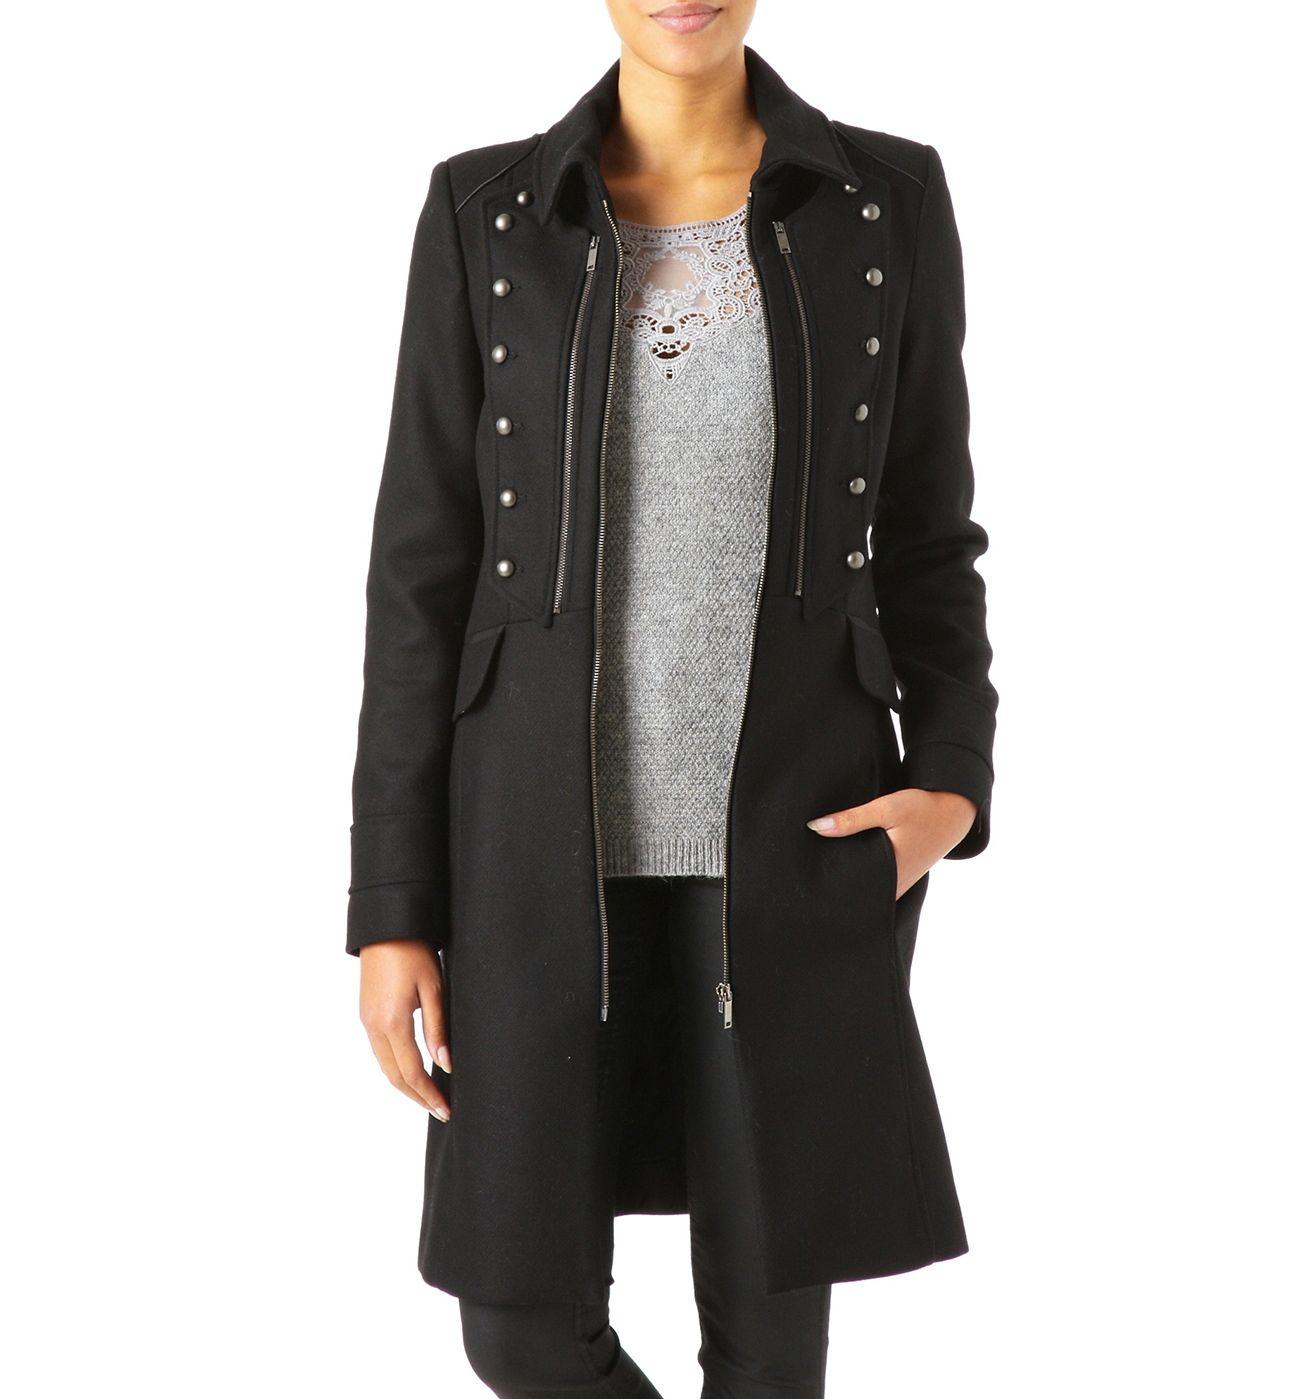 manteau promod achat manteau officier femme promod prix promo promod 99 95 ttc mode. Black Bedroom Furniture Sets. Home Design Ideas